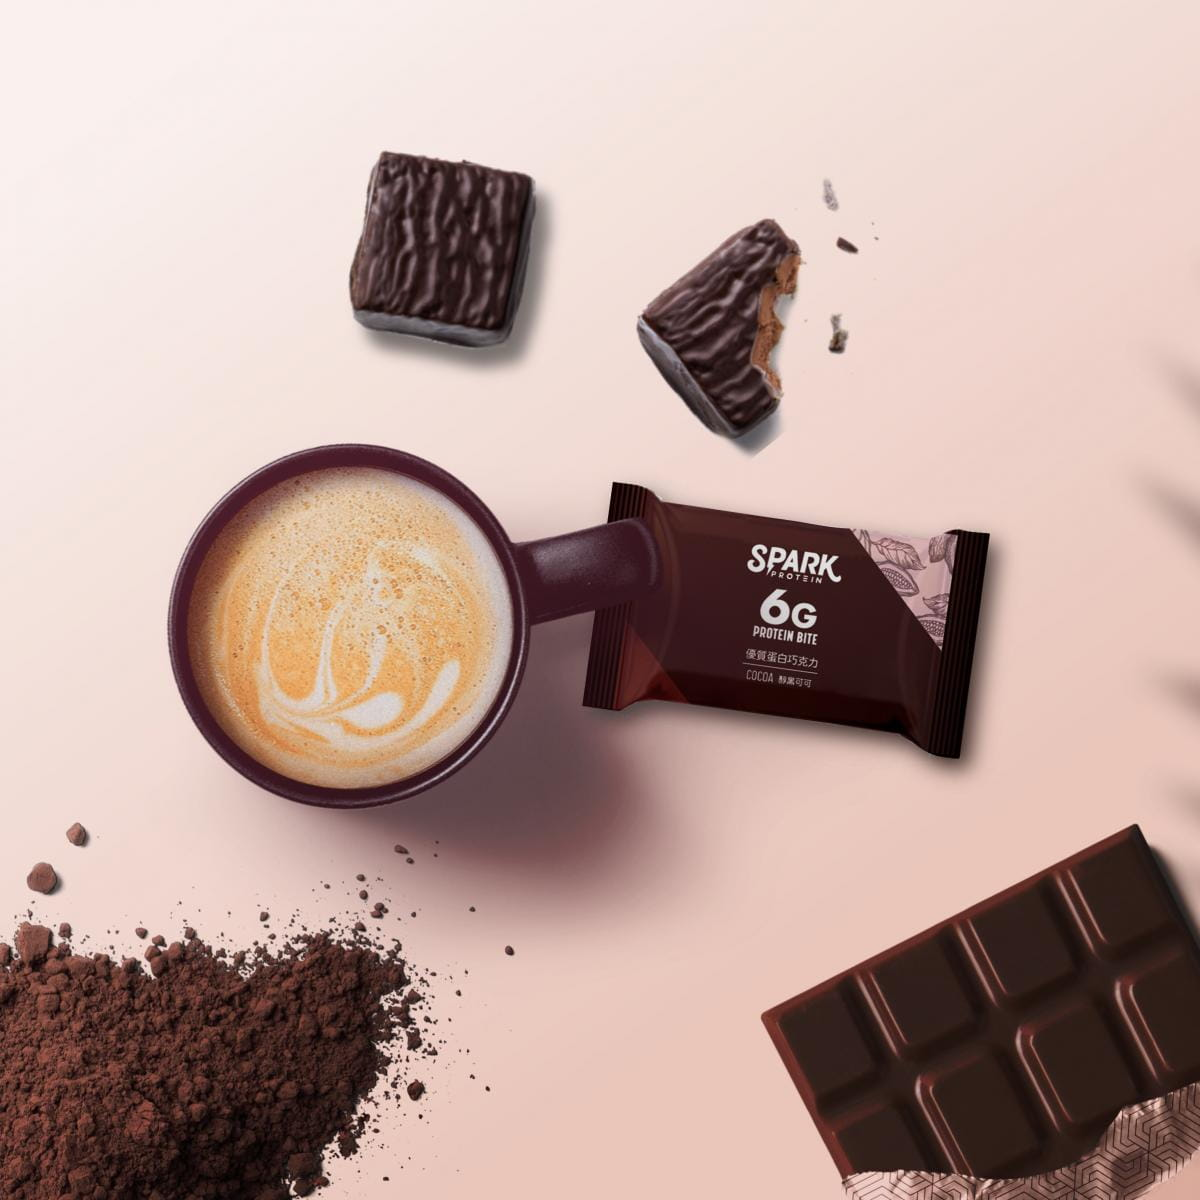 【Spark Protein】Spark Bite 優質蛋白巧克力8入組/盒(口味任選)加增草莓牛奶隨手包 11